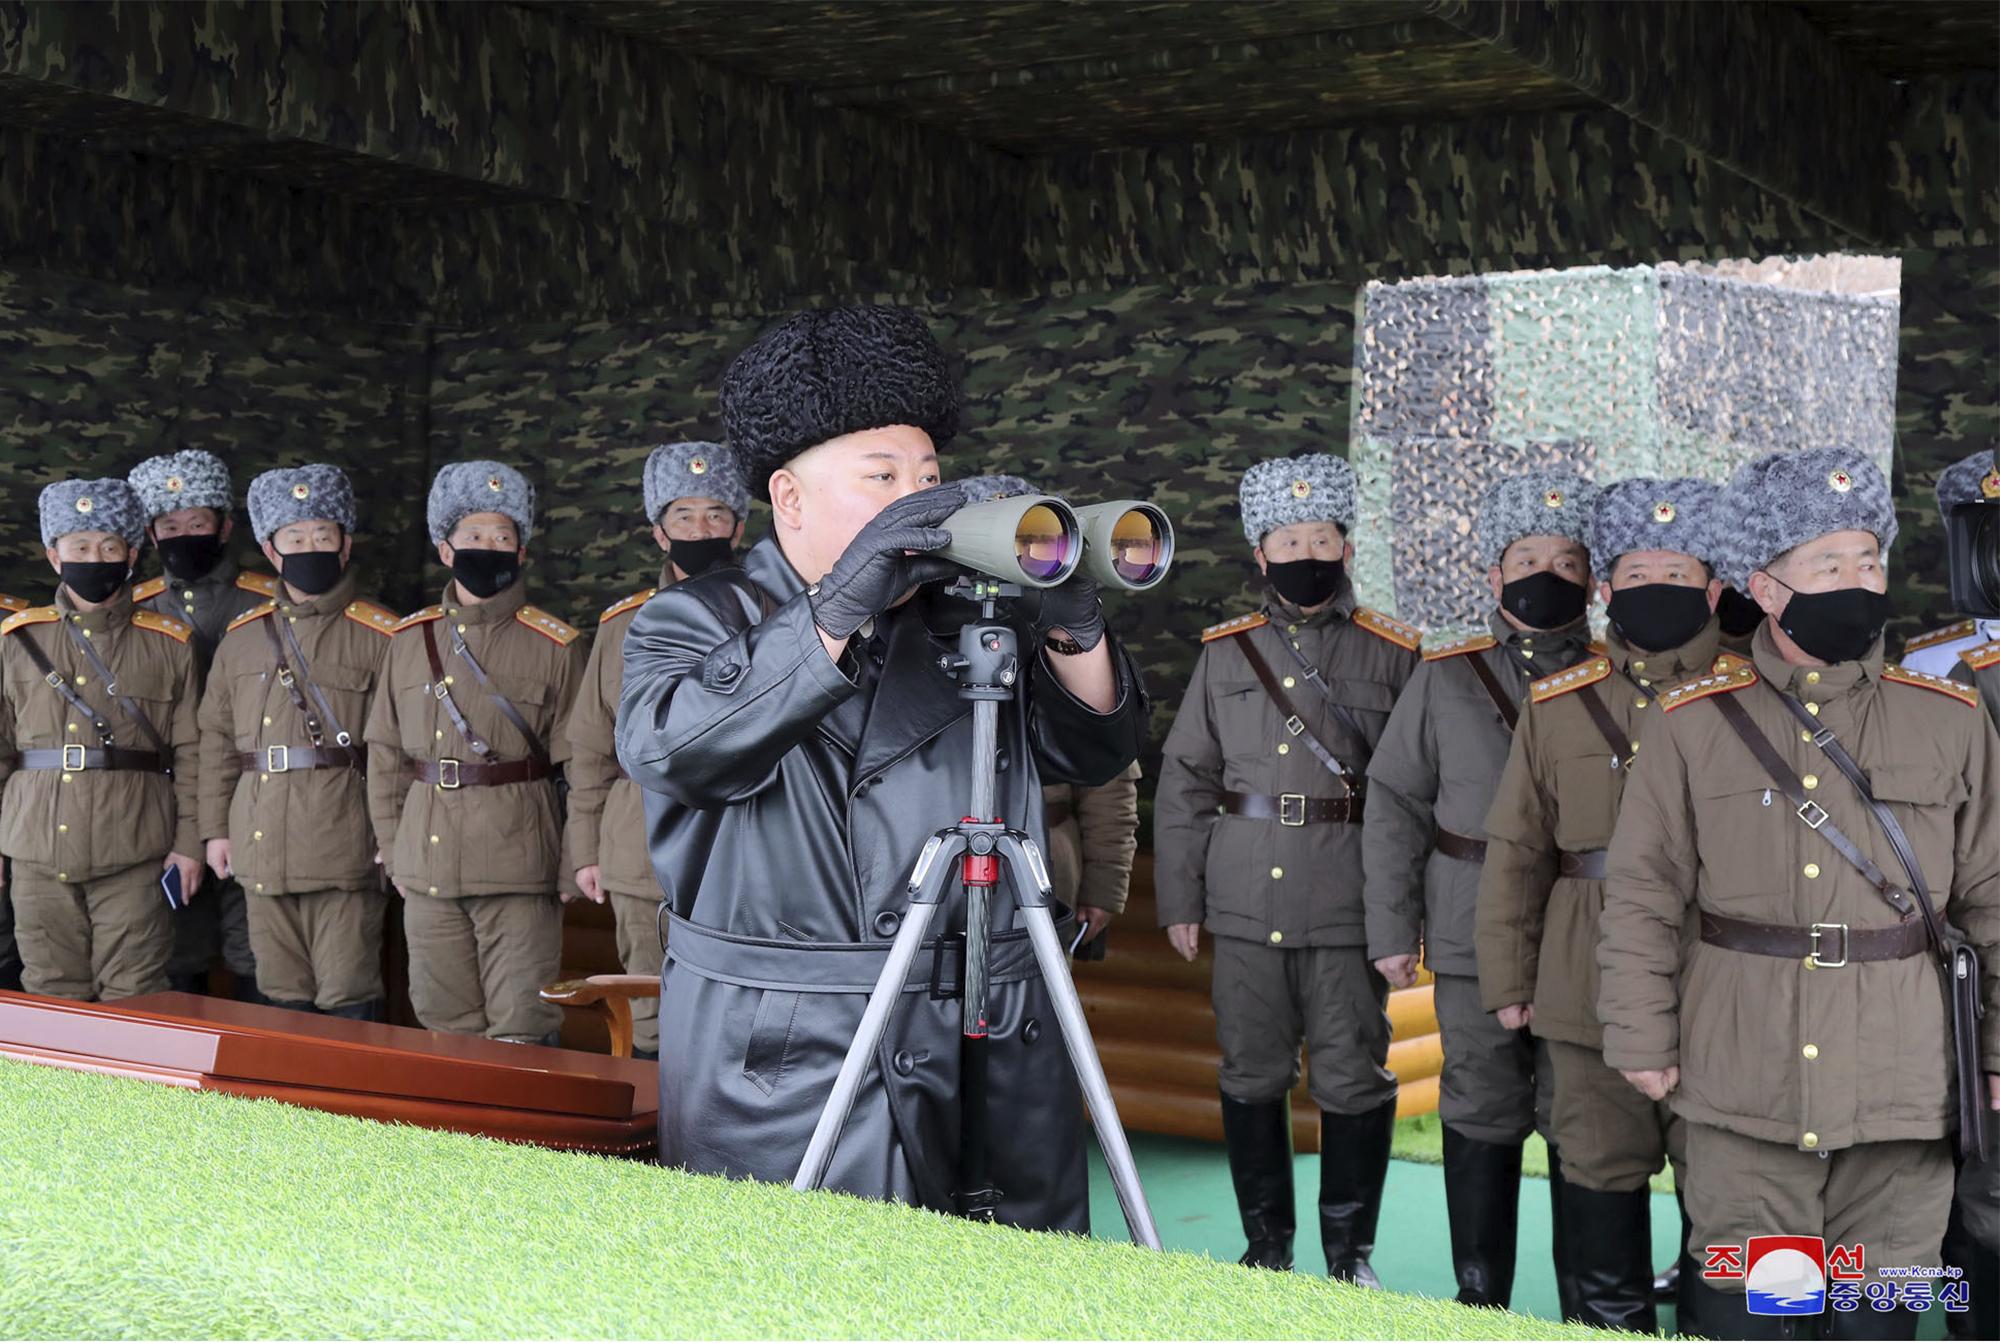 North Korea fires presumed short-range missiles into the sea